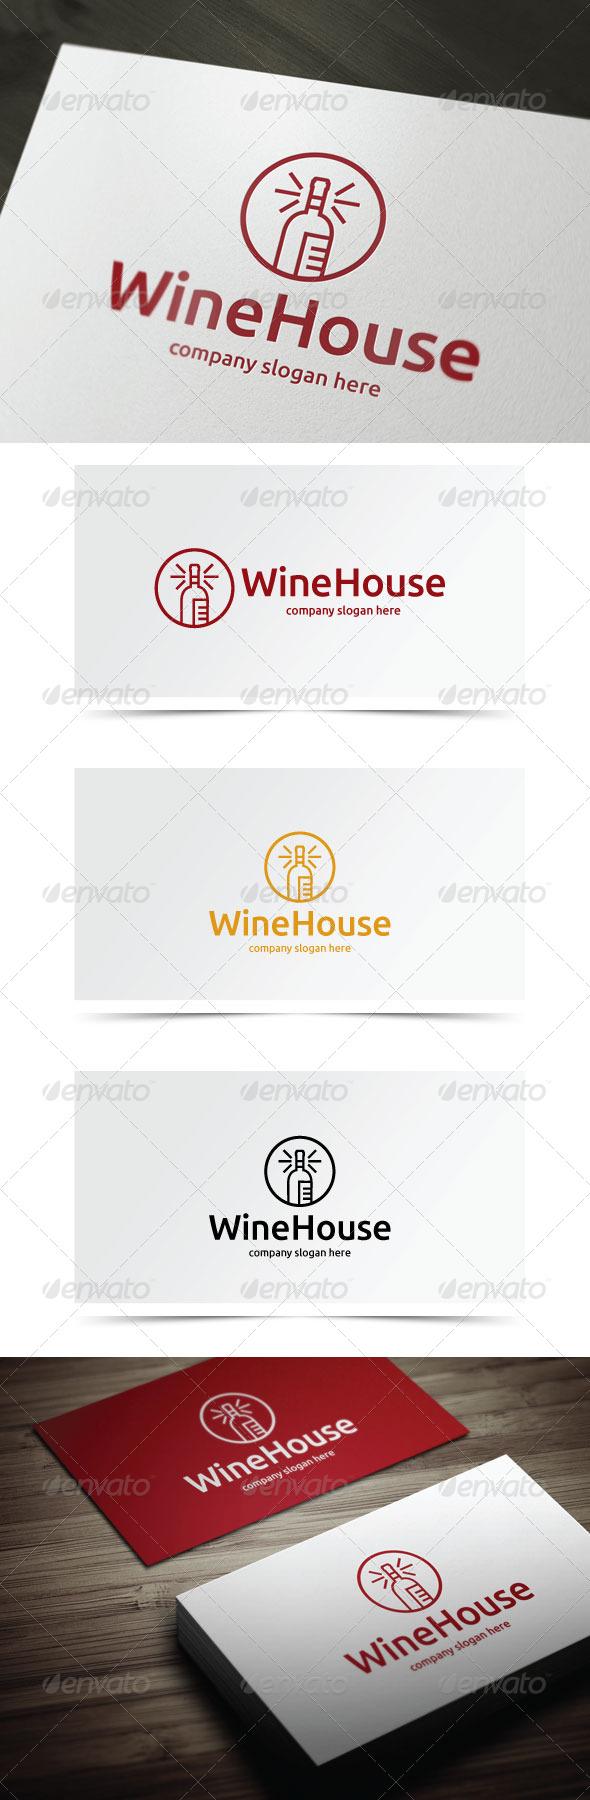 GraphicRiver Wine House 5776906